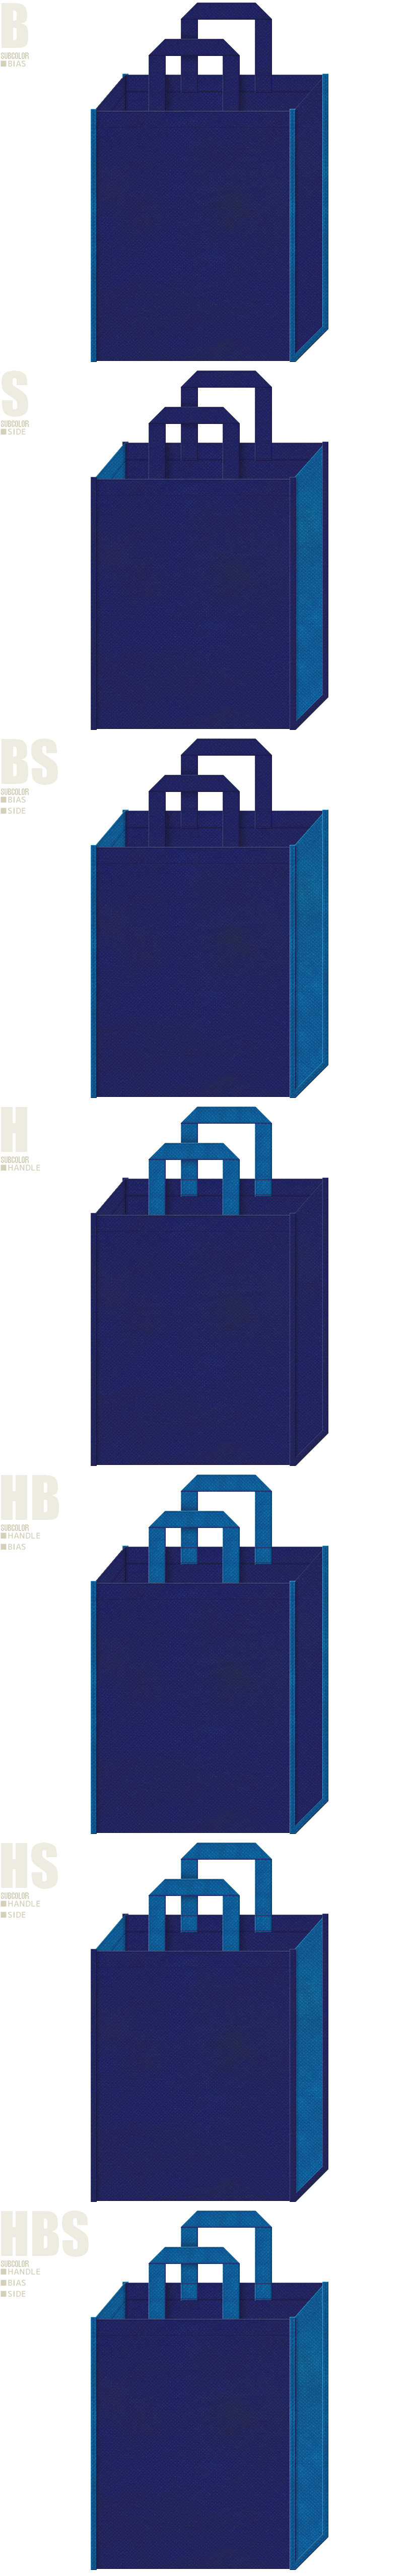 LEDセミナーの資料配布用バッグにお奨めの、紺紫色と青色-7パターンの不織布トートバッグ配色デザイン例